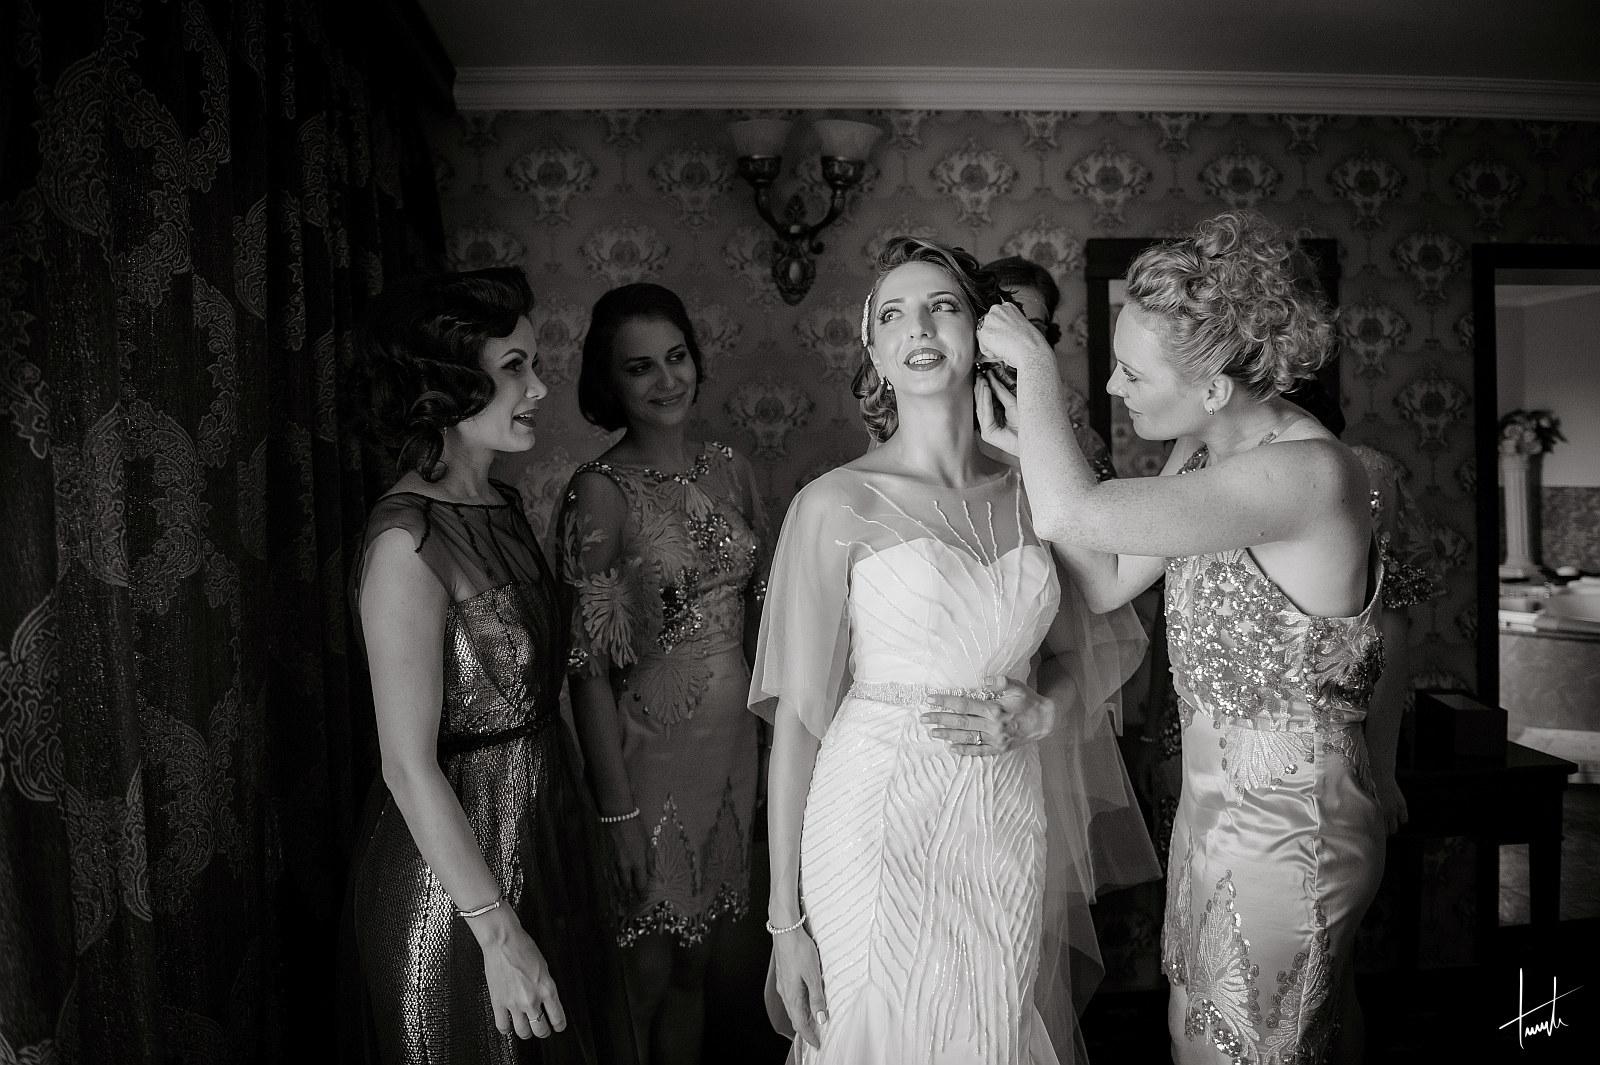 fotografie de nunta - Alina Mircea - by Bogdan Terente 08